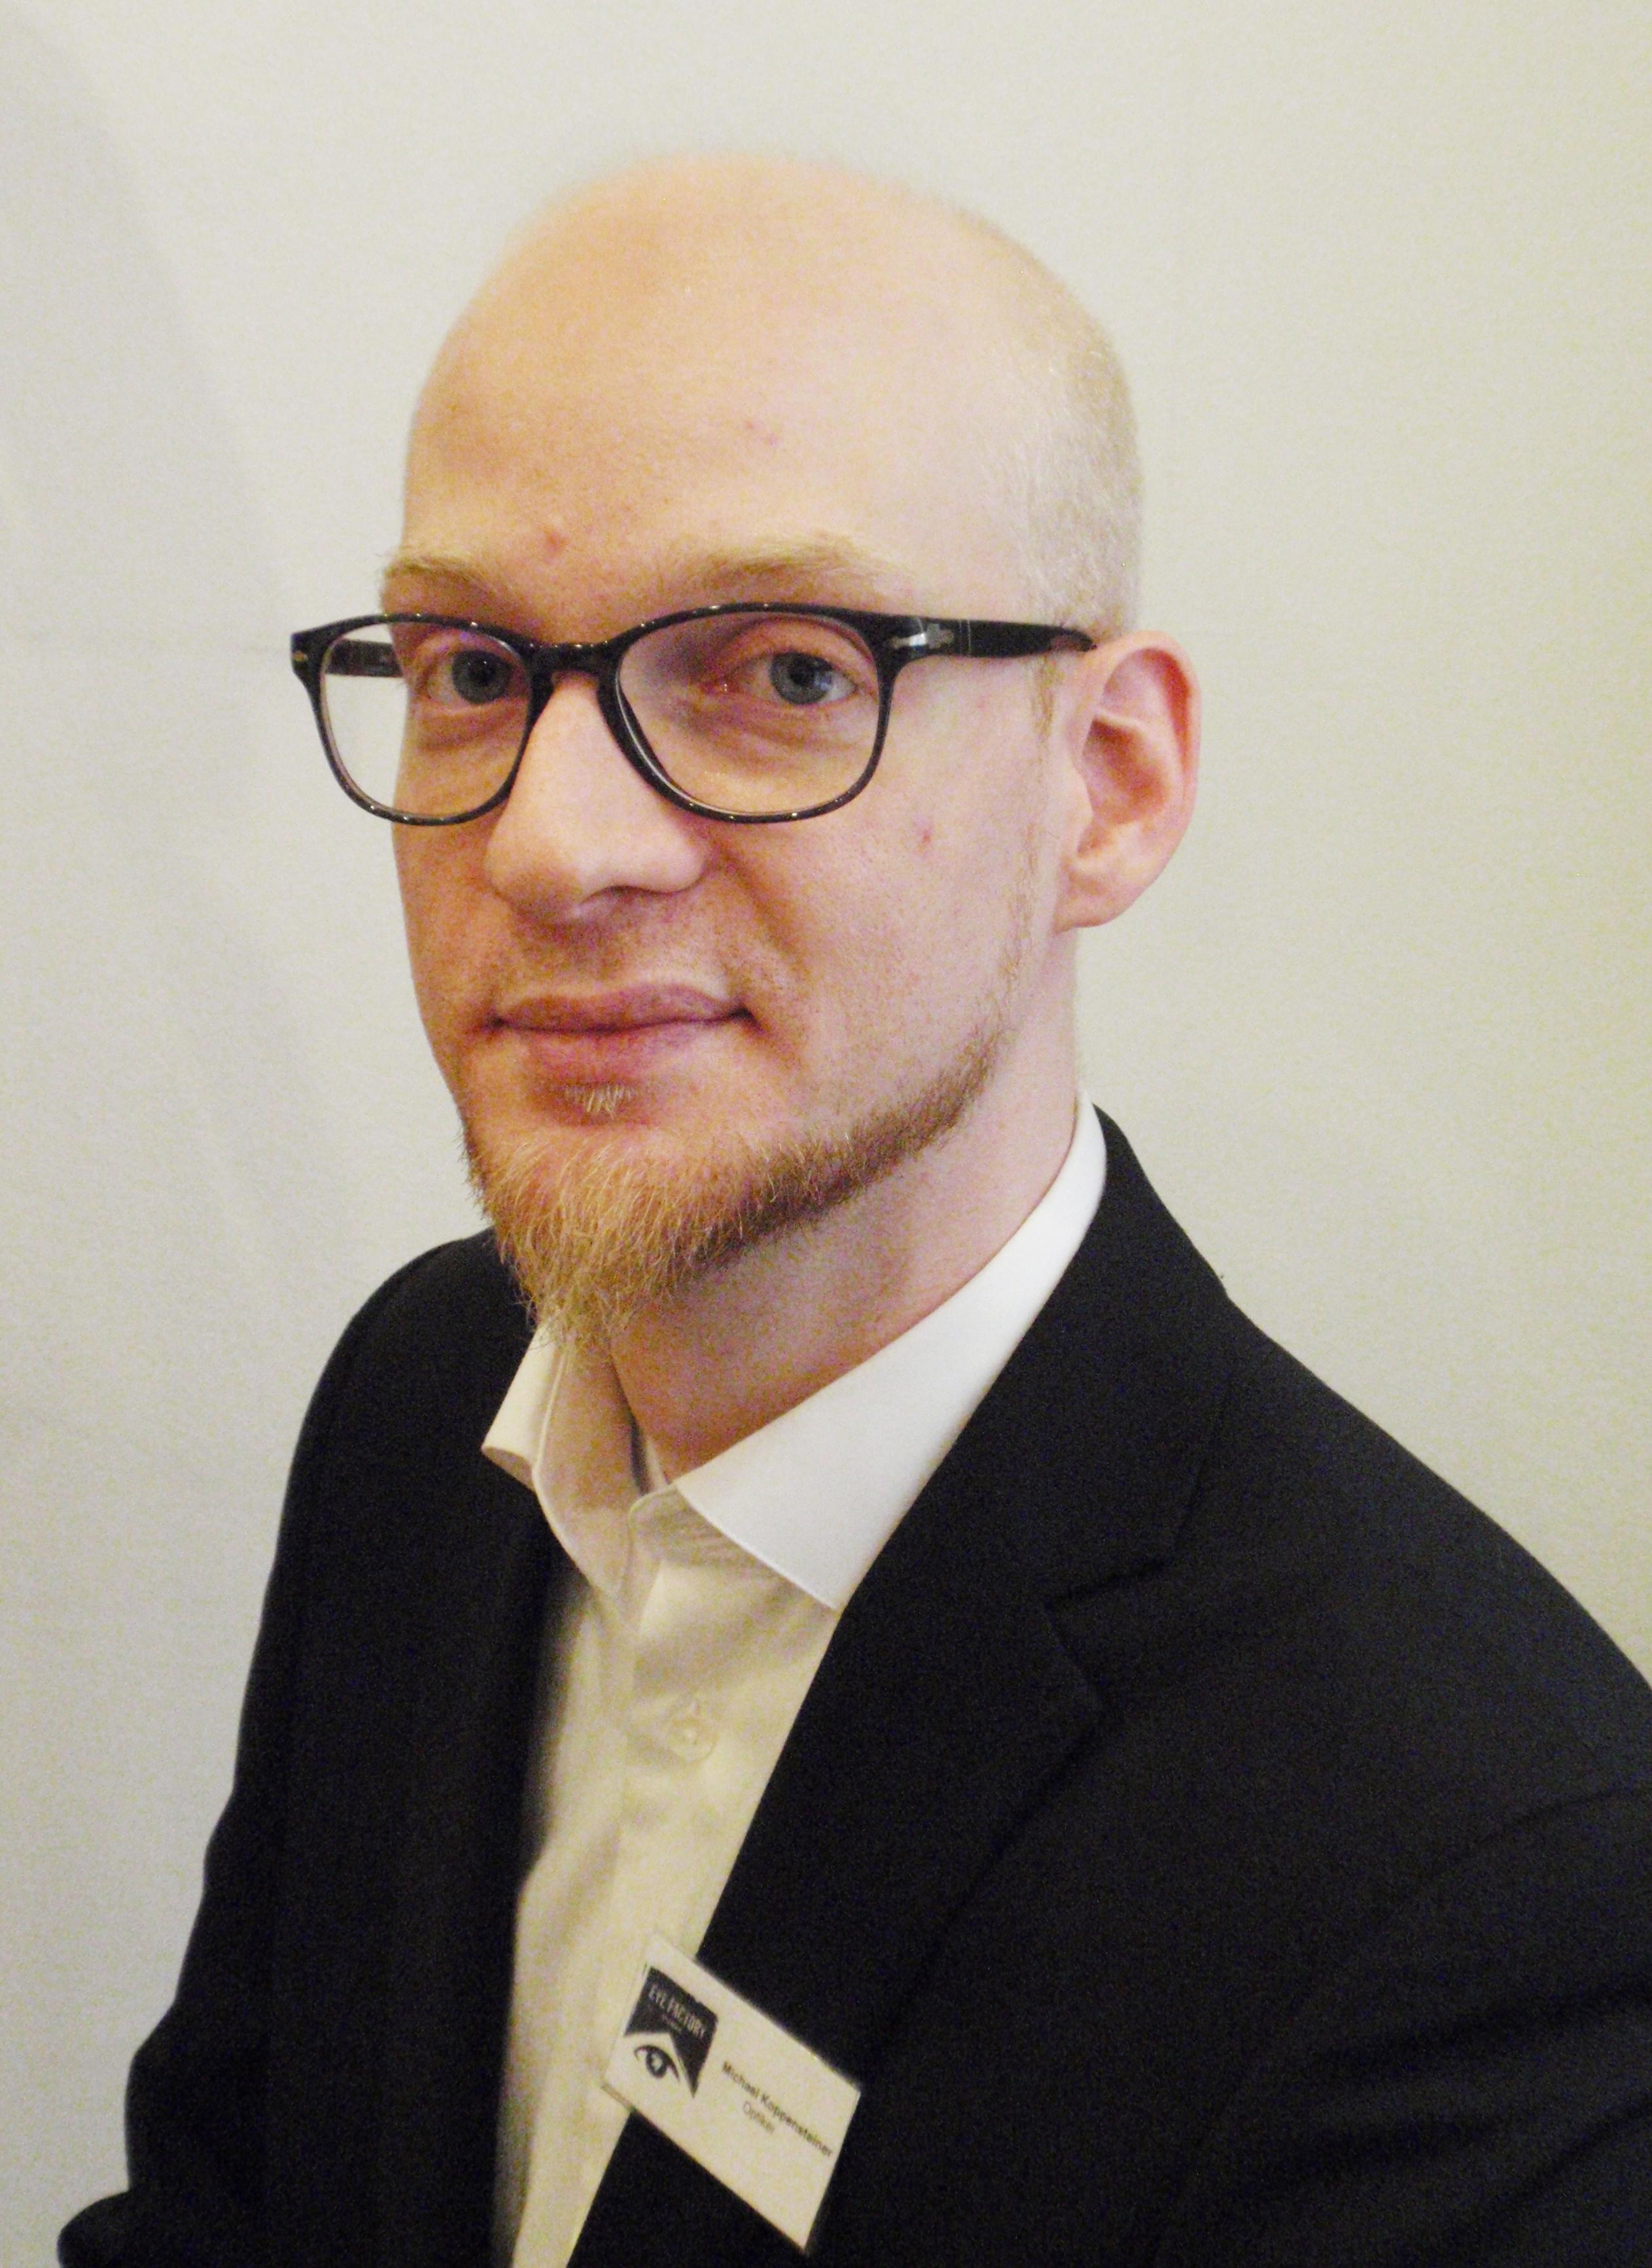 Michael Koppensteiner